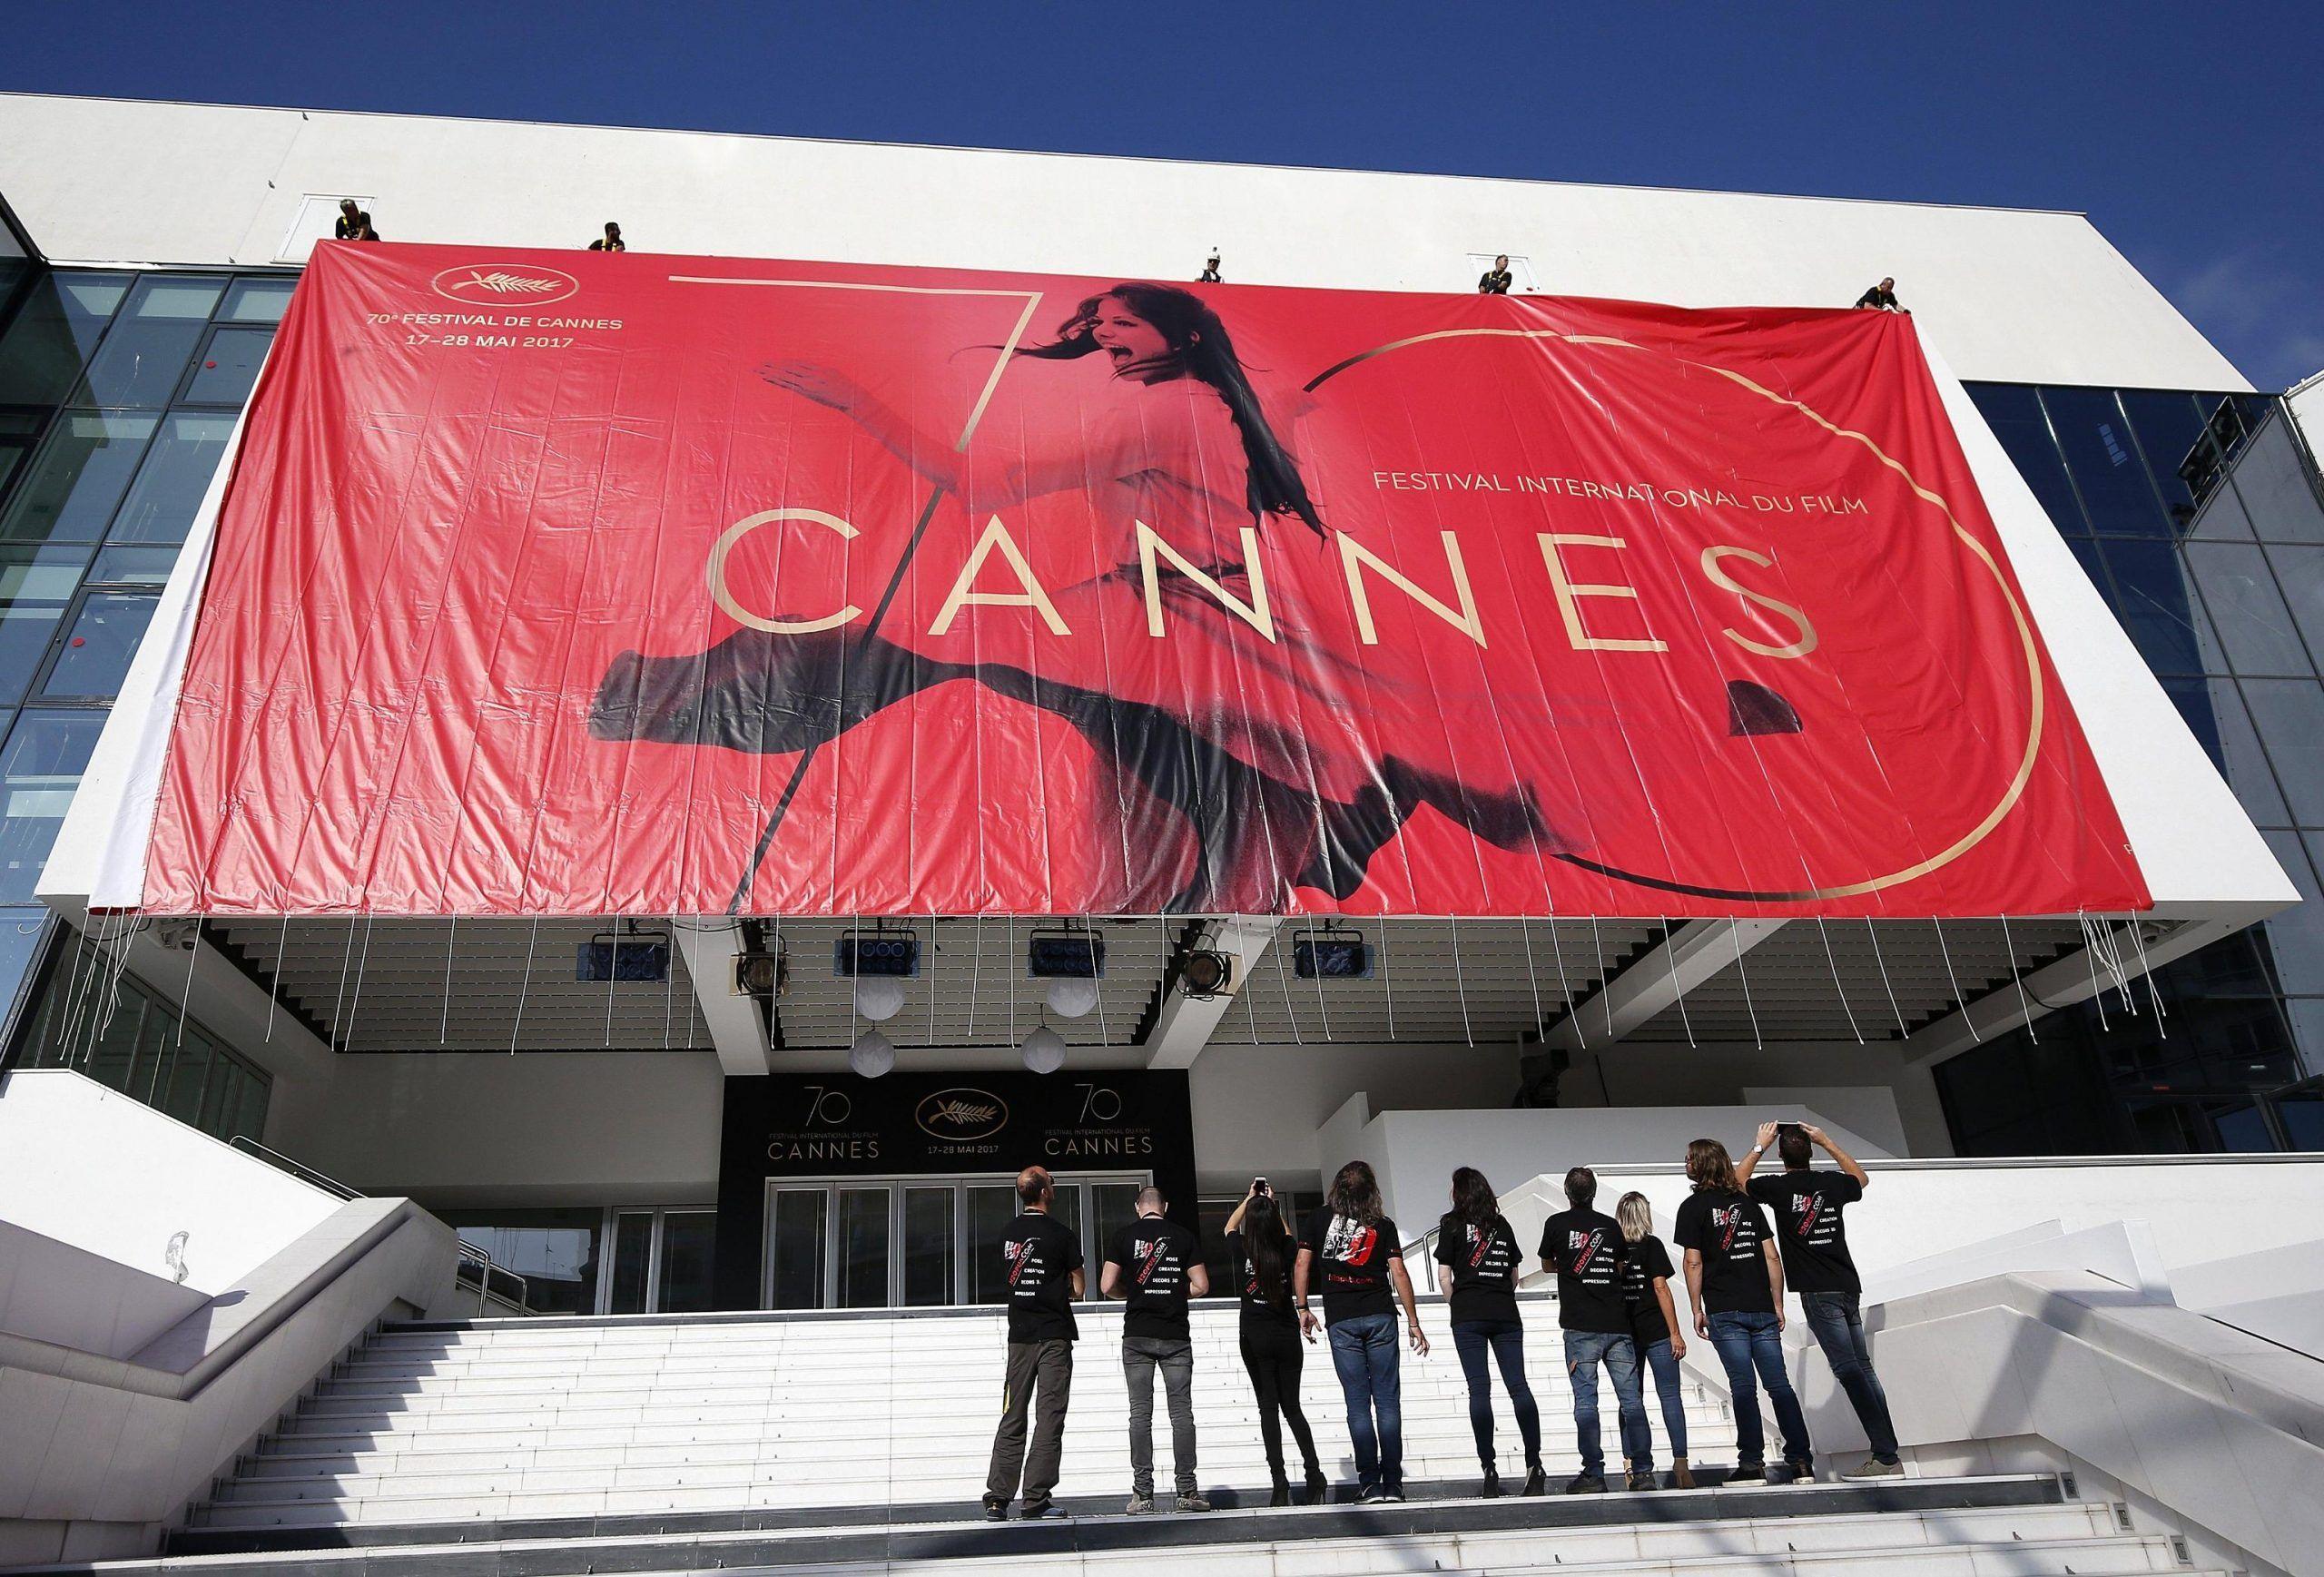 Festival di Cannes 2017: date, biglietti, attori ospiti e film